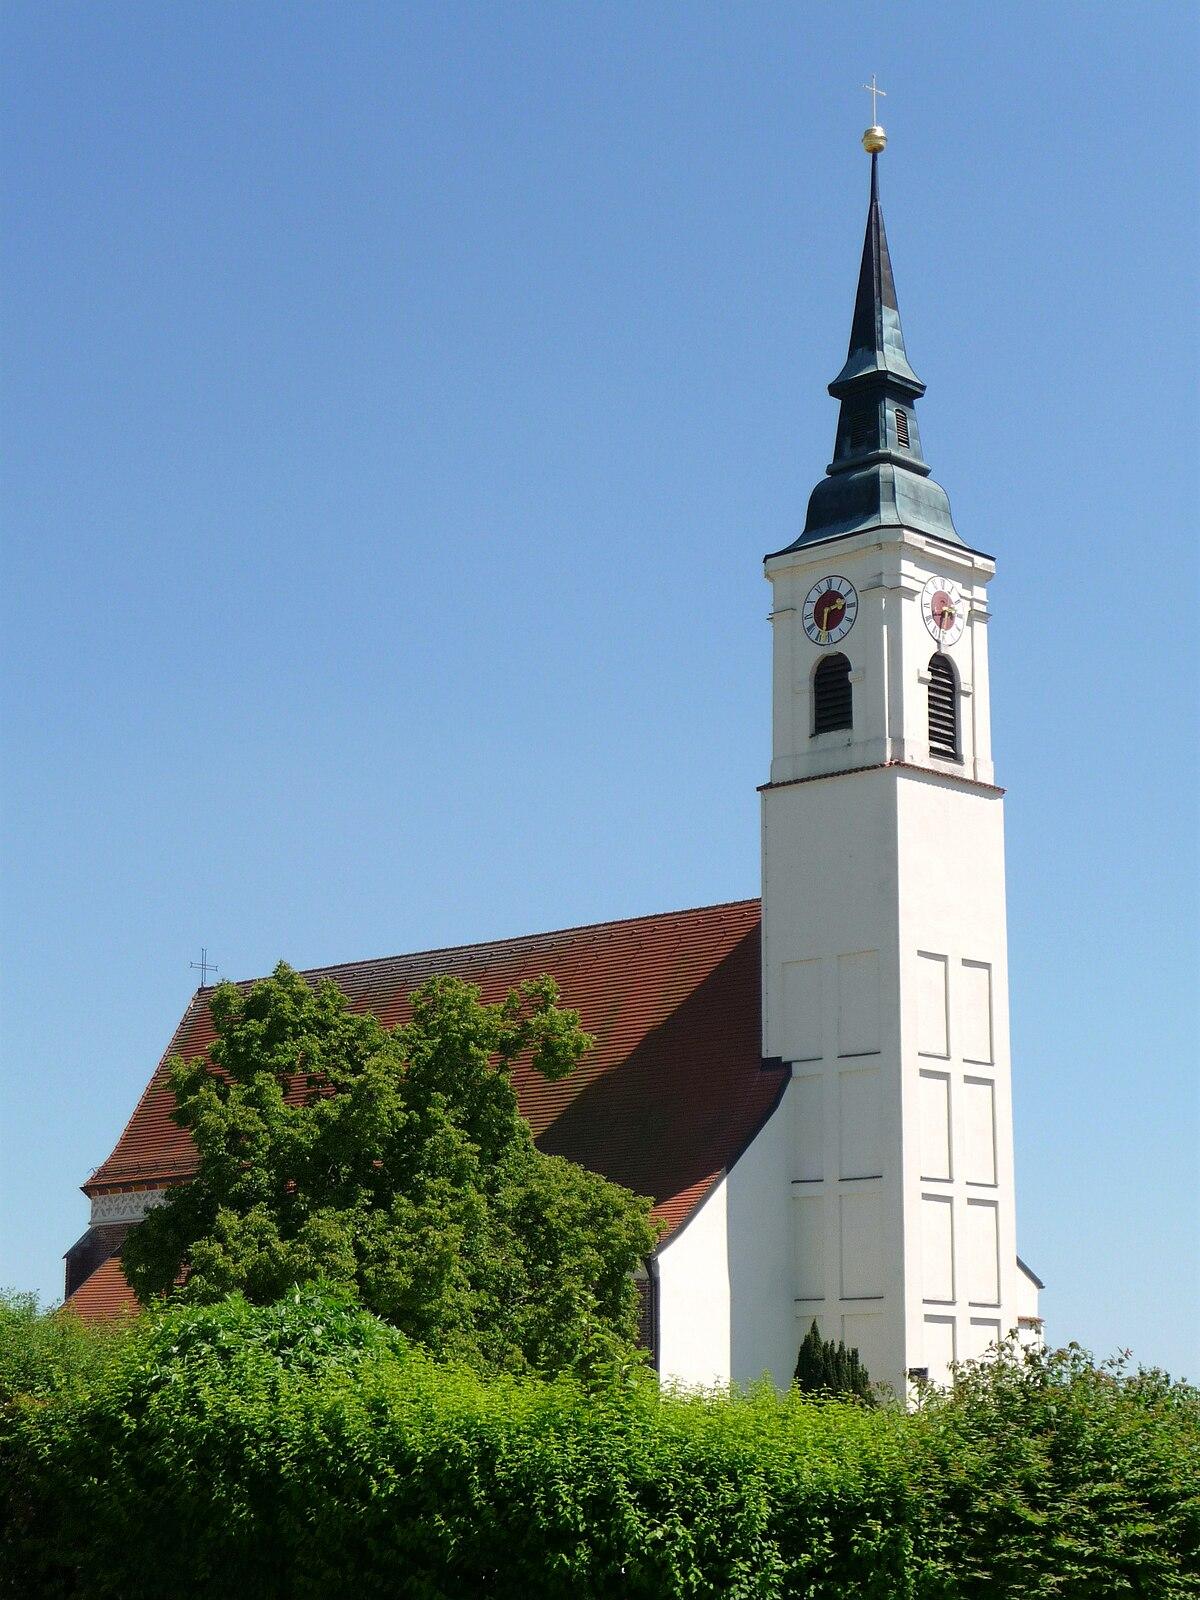 Altdorf, Lower Bavaria - Wikipedia